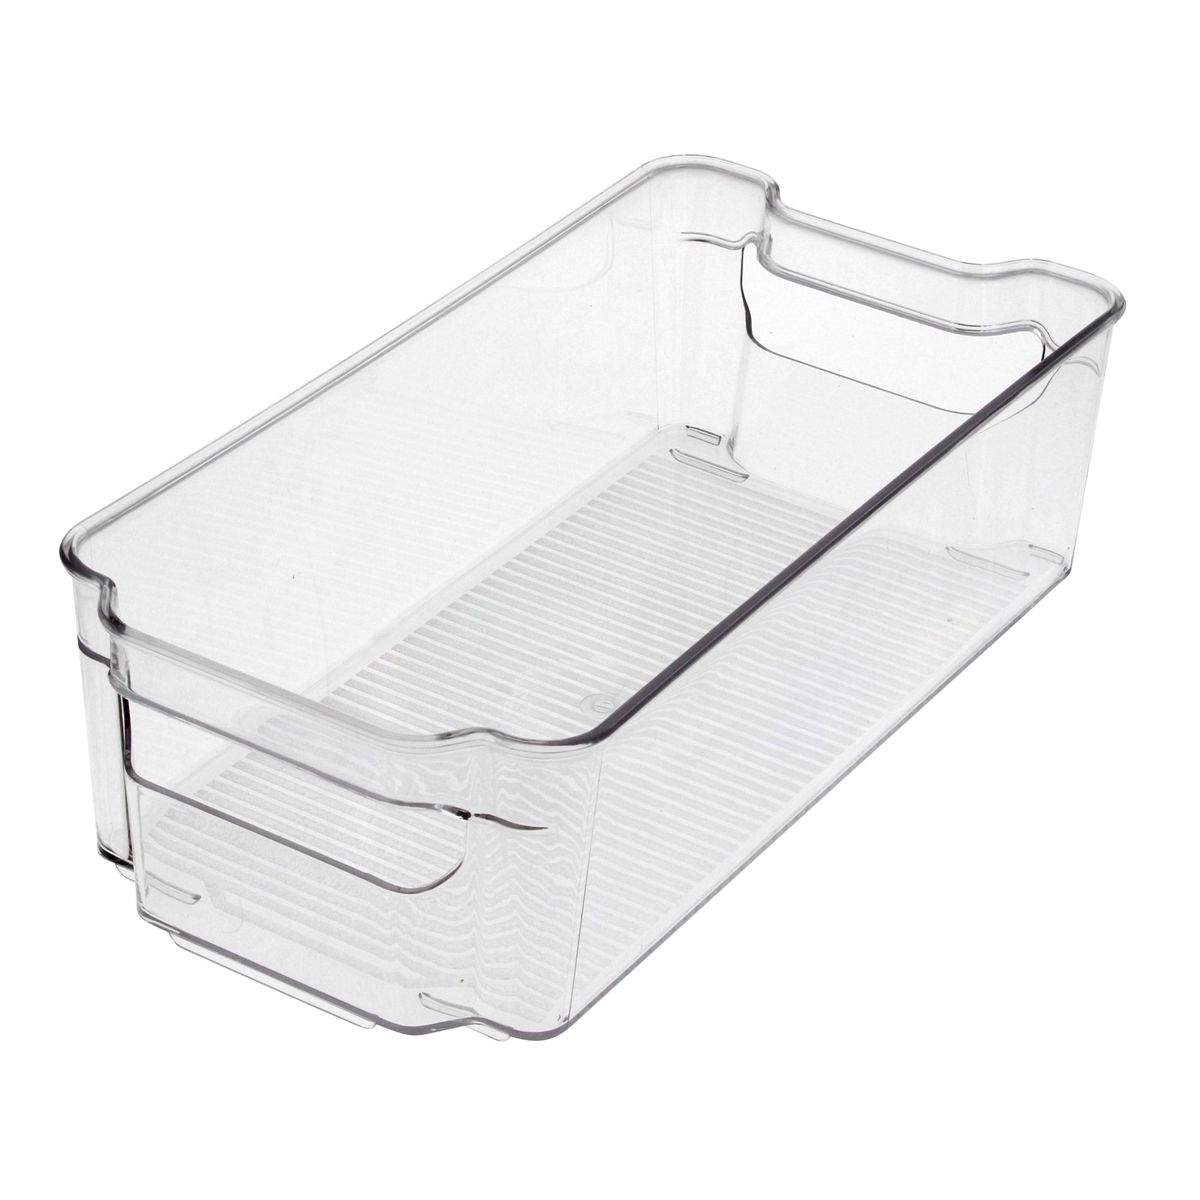 Bac rangement frigo 5l - 5Five